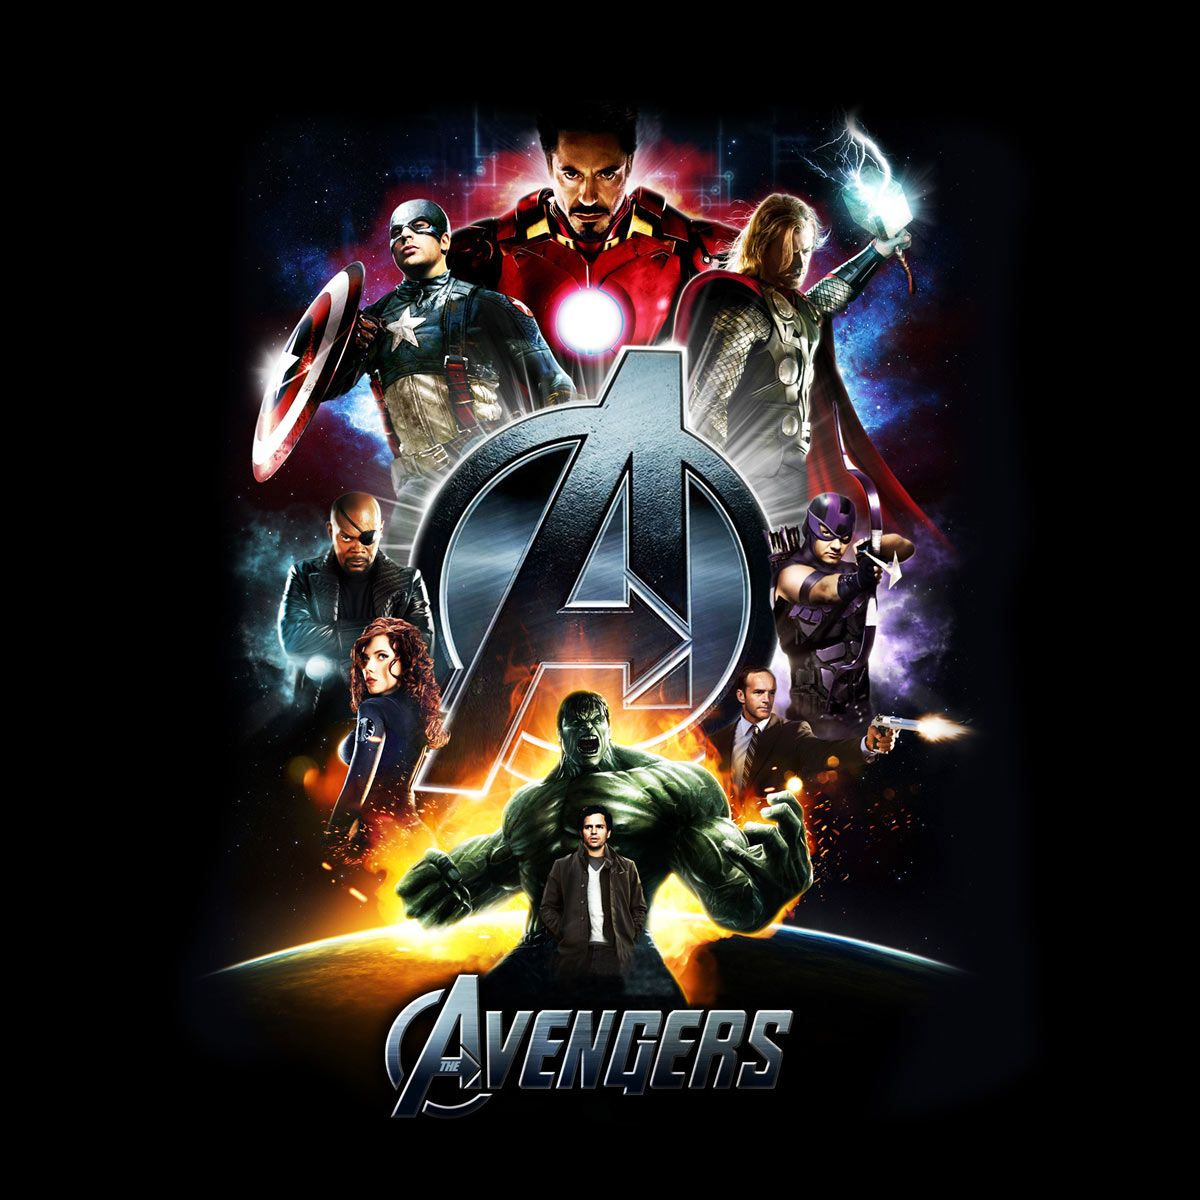 Camiseta Los Vengadores (The Avengers). Personajes, Hulk